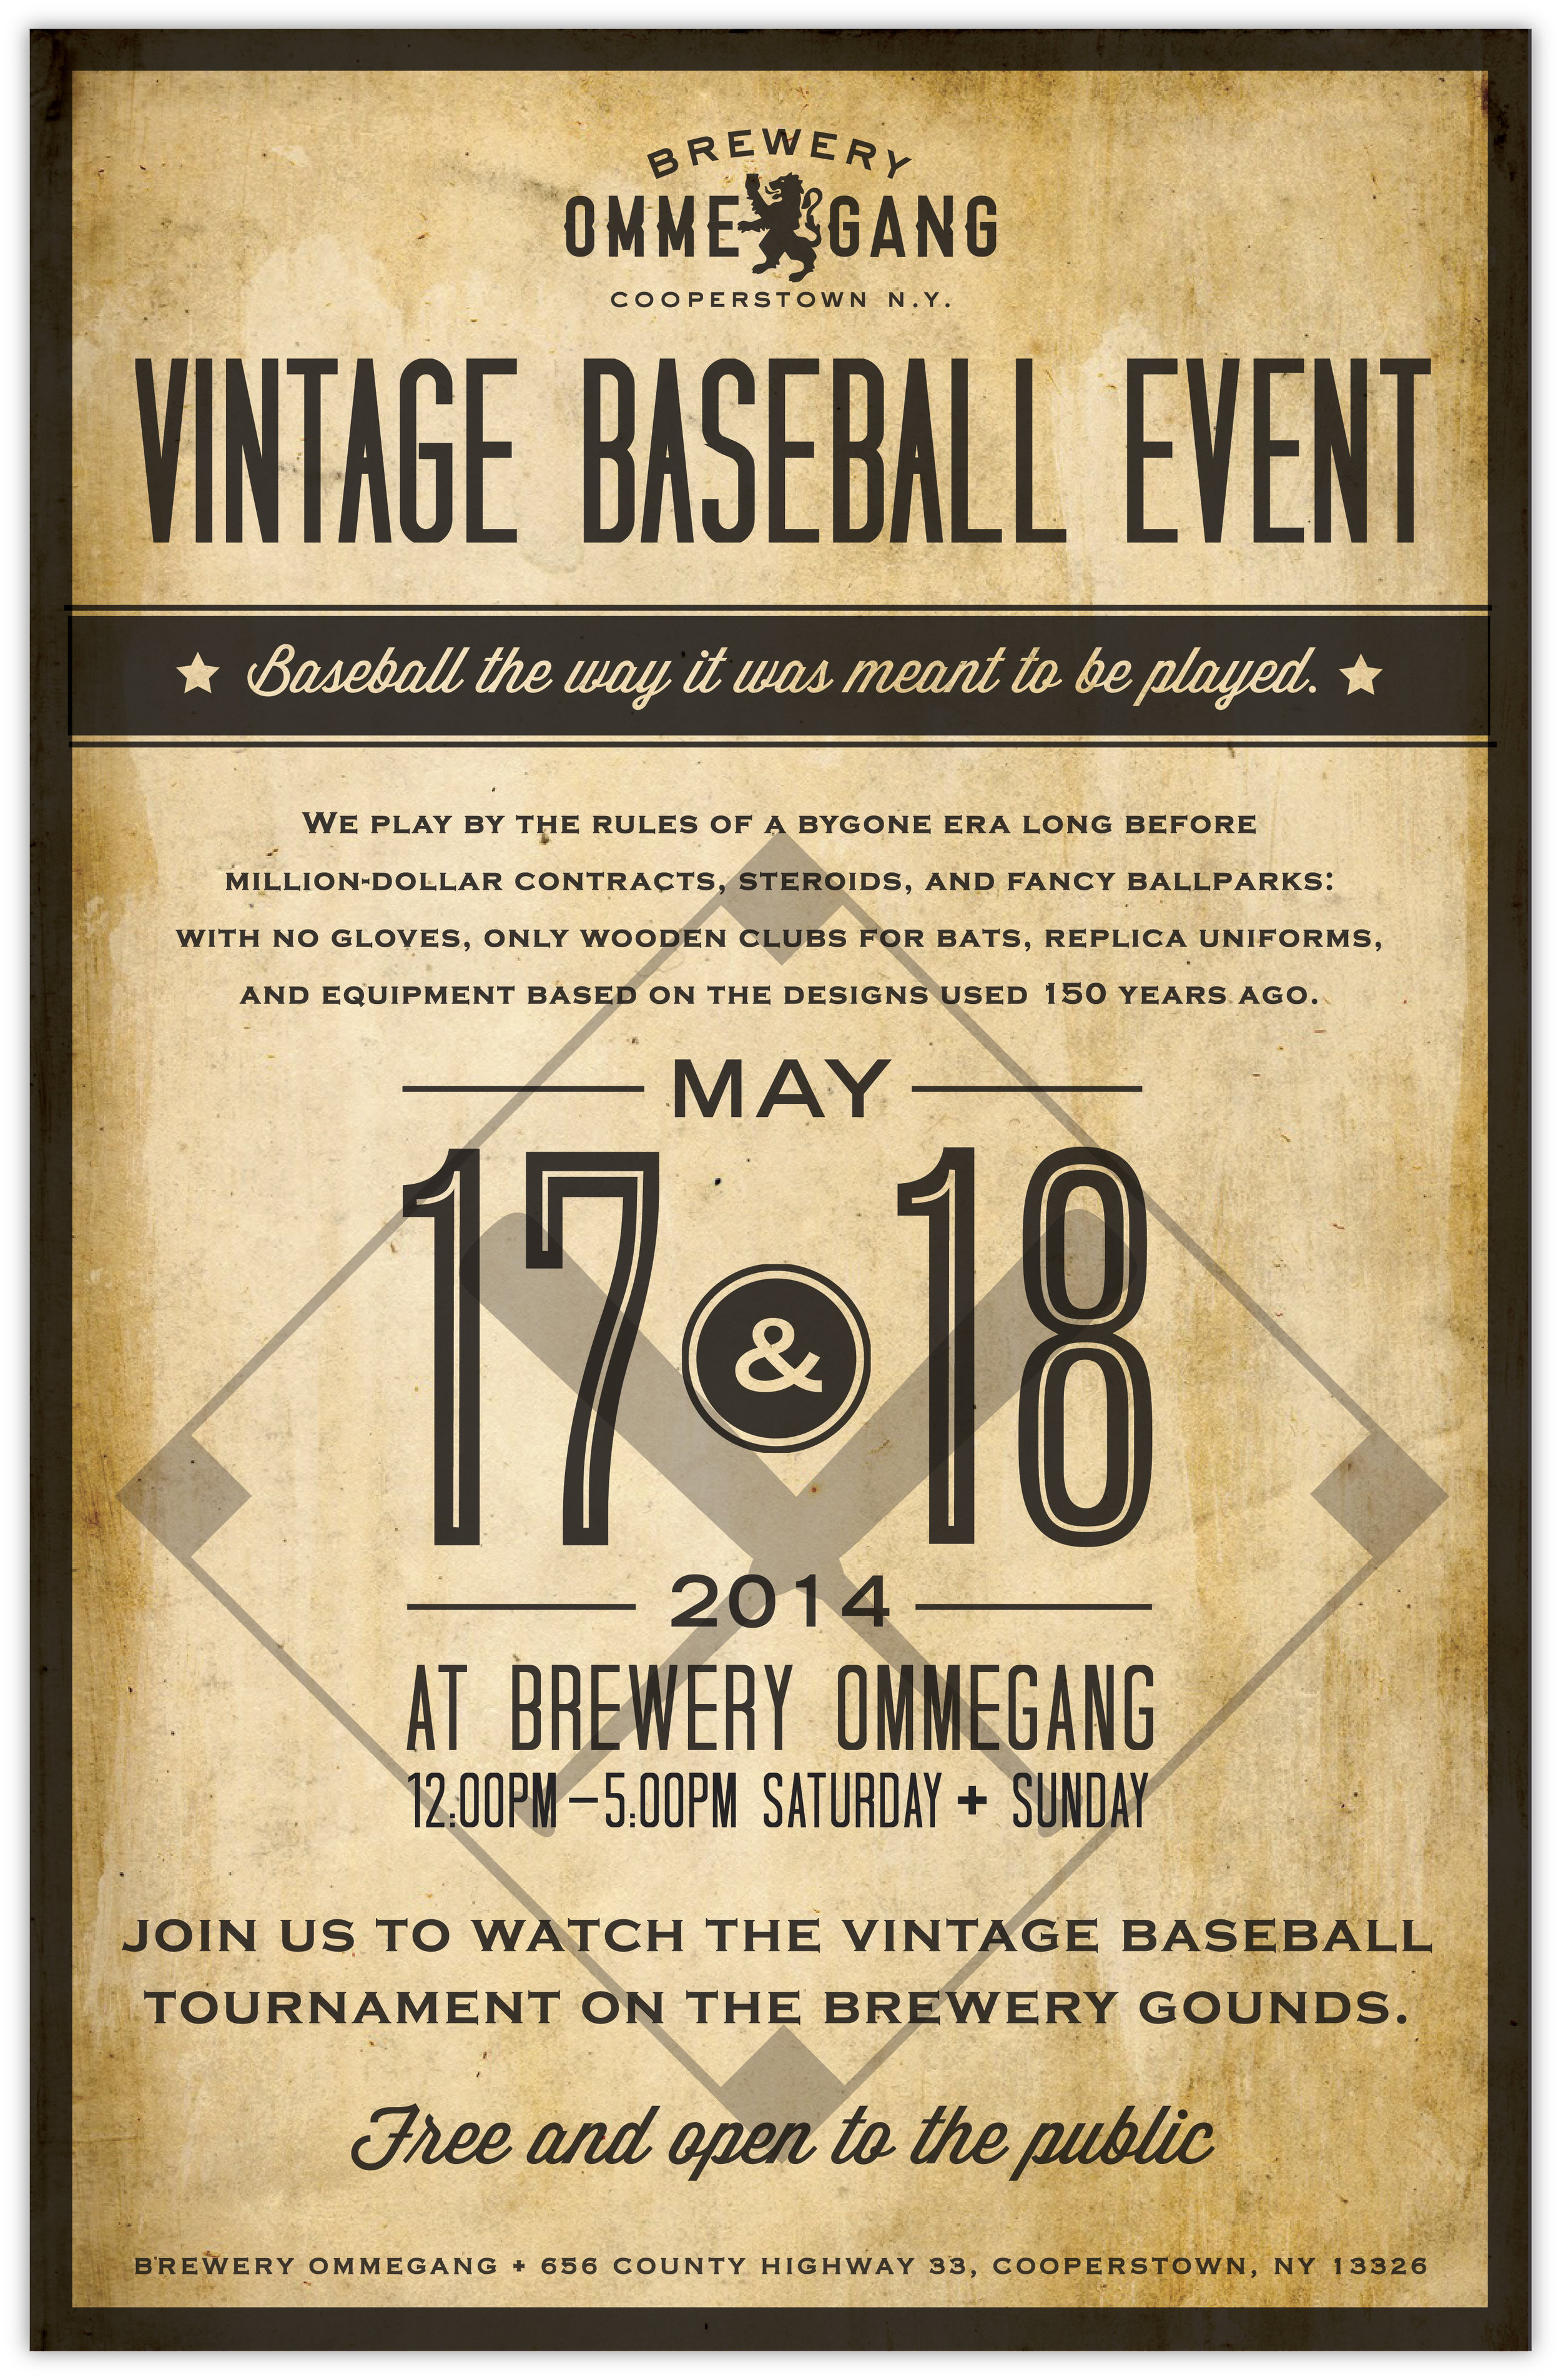 Vintage Baseball Poster MockUp.jpg